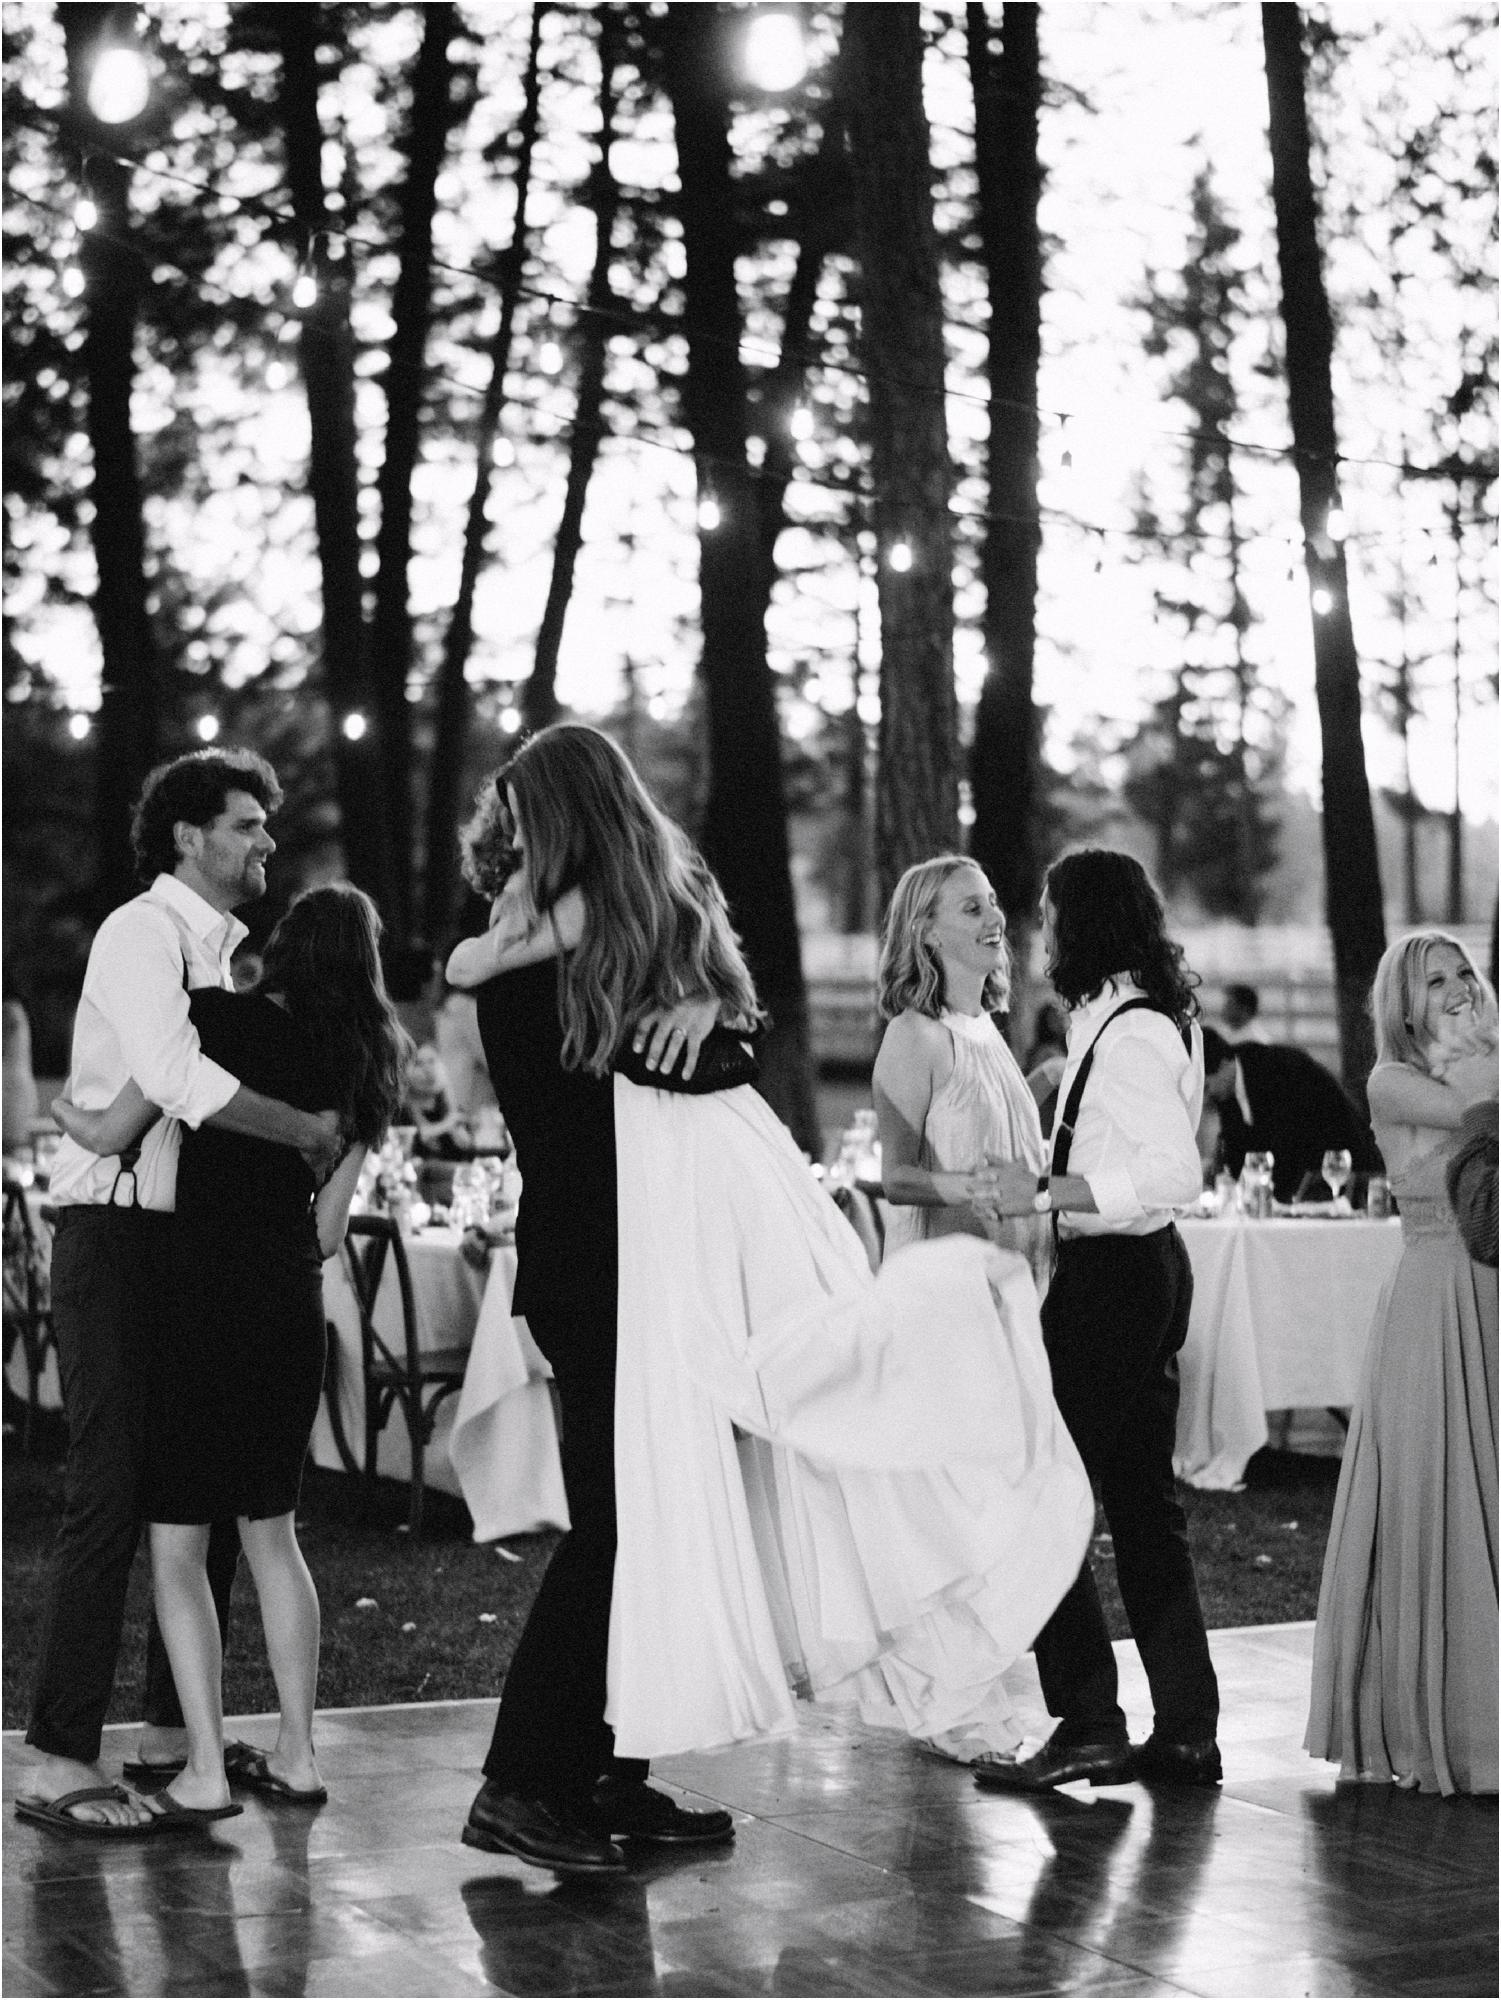 Intimate Montana Destination Wedding at Glacier Mountain Lodge ©Jeremiah and Rachel Photography http://jeremiahandrachel.com